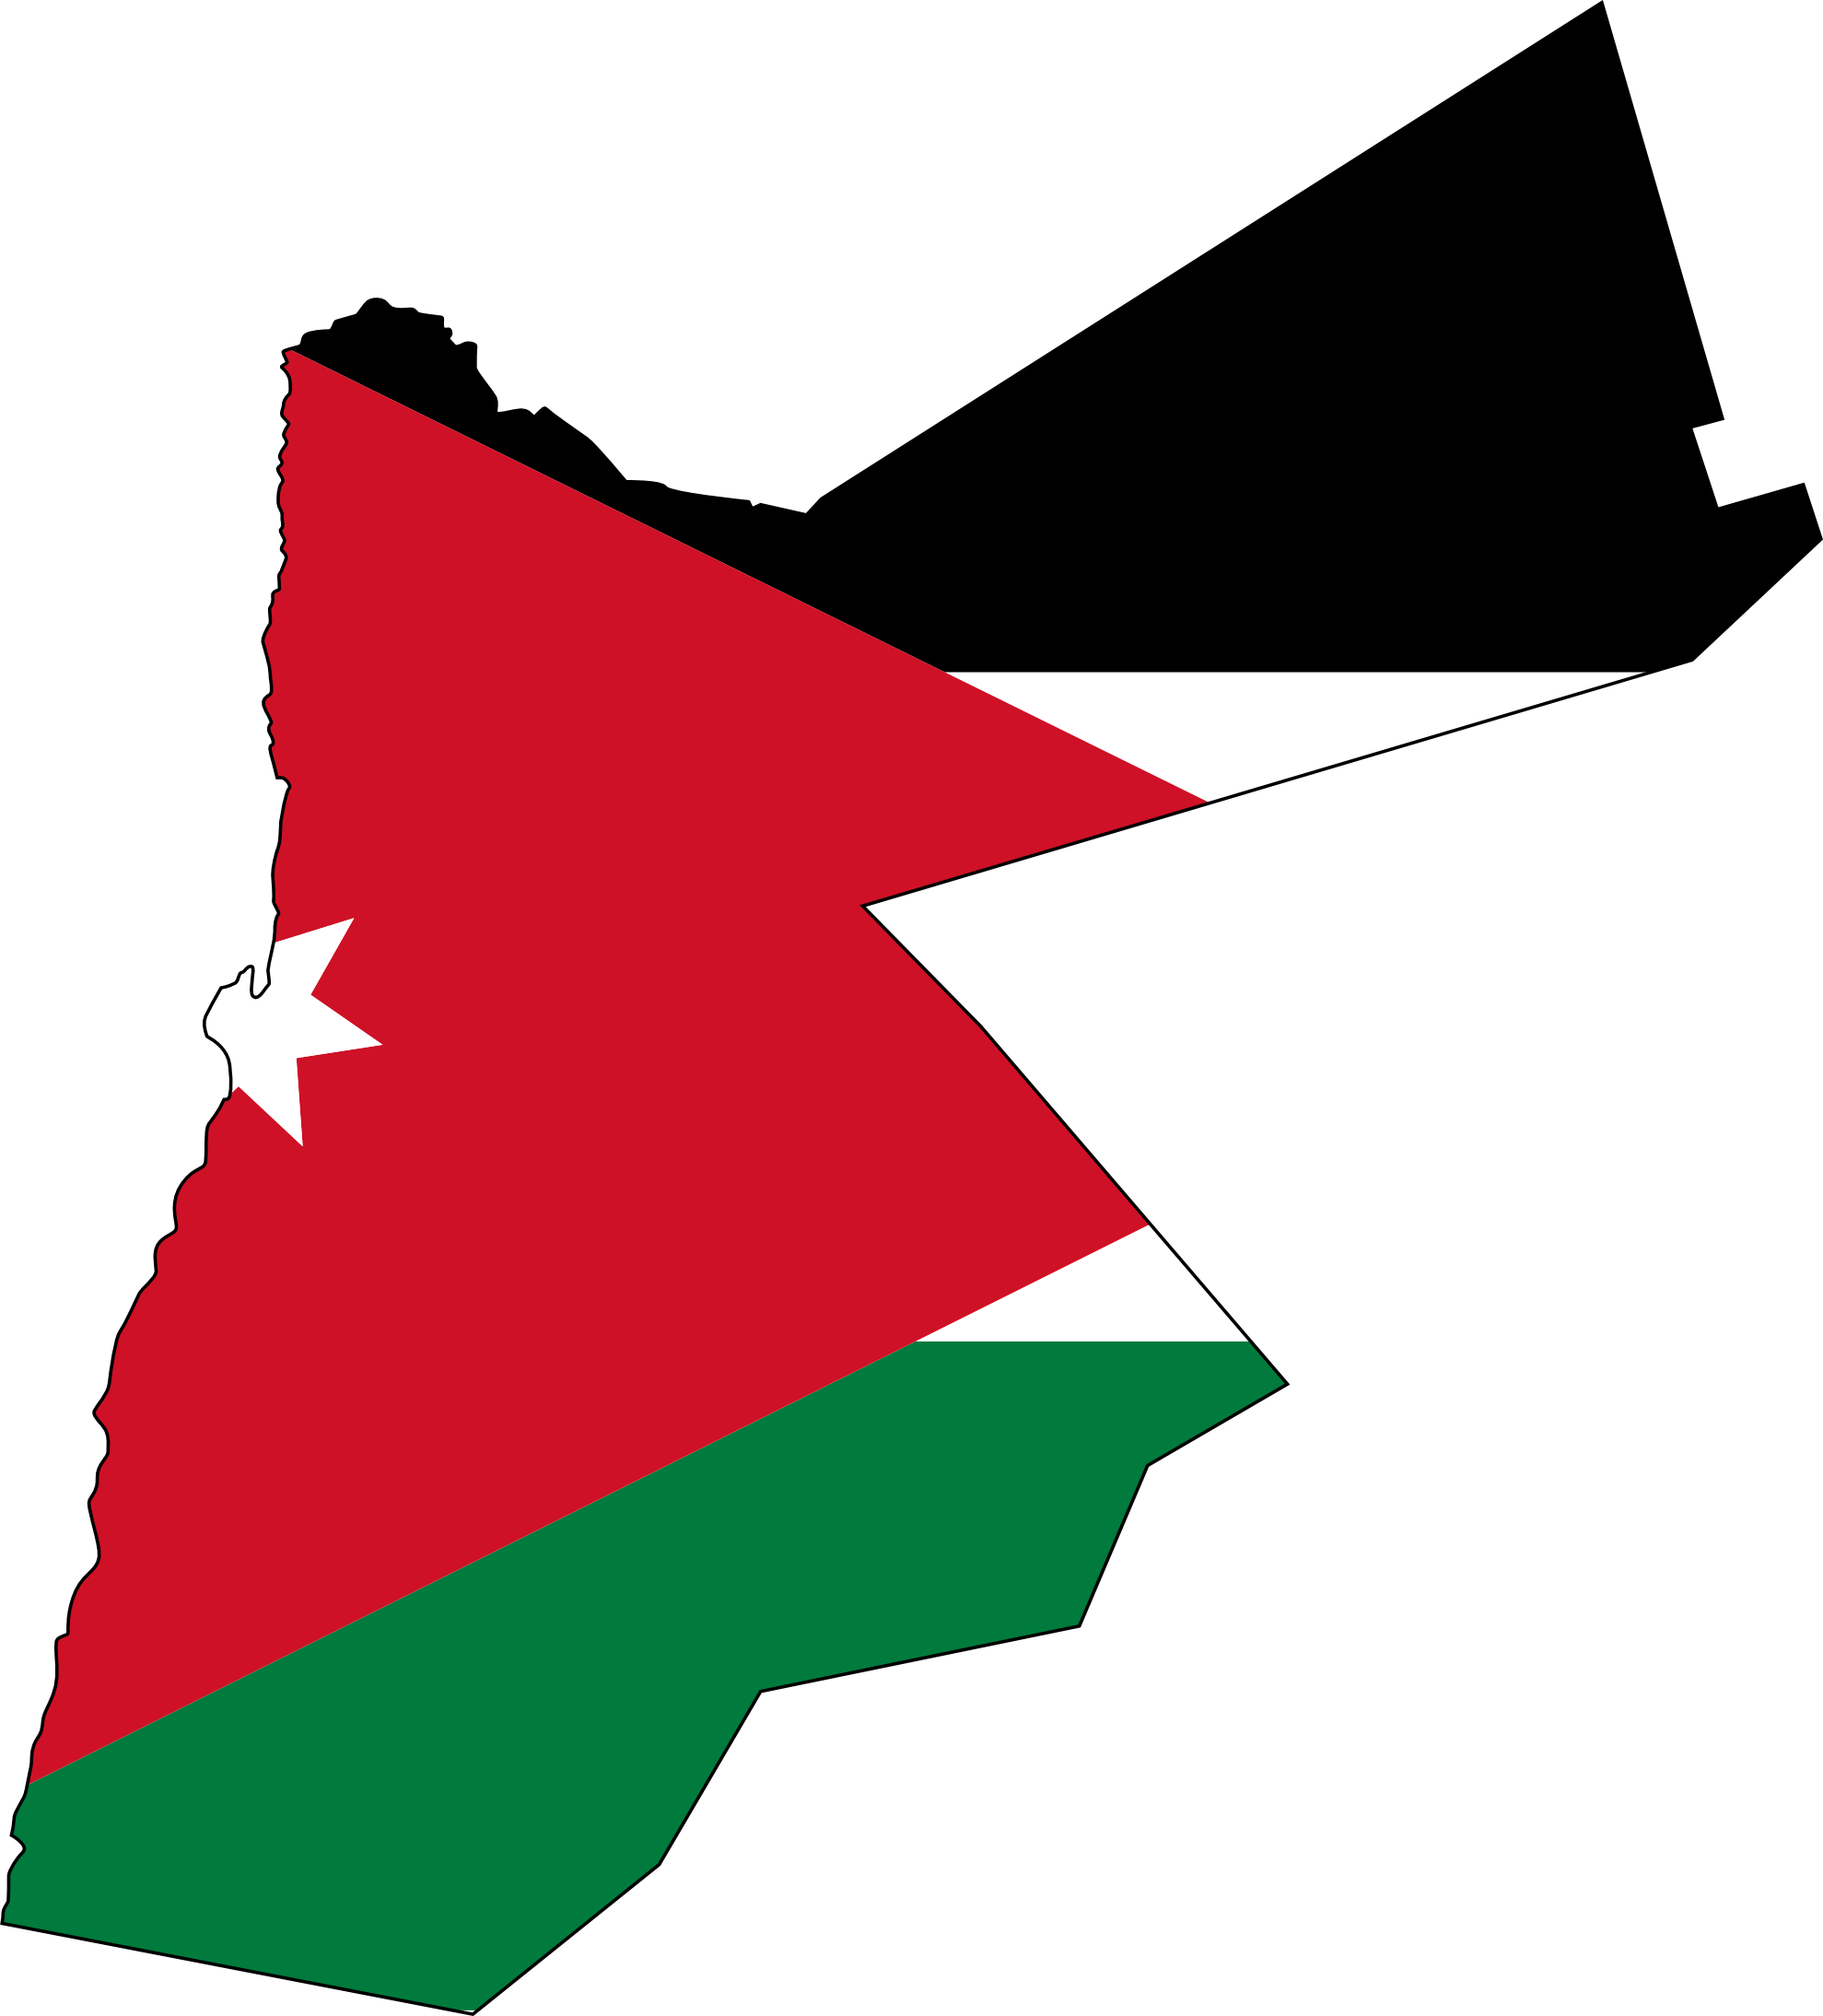 Hurricane clipart hurricane flag. Jordanian panda free images